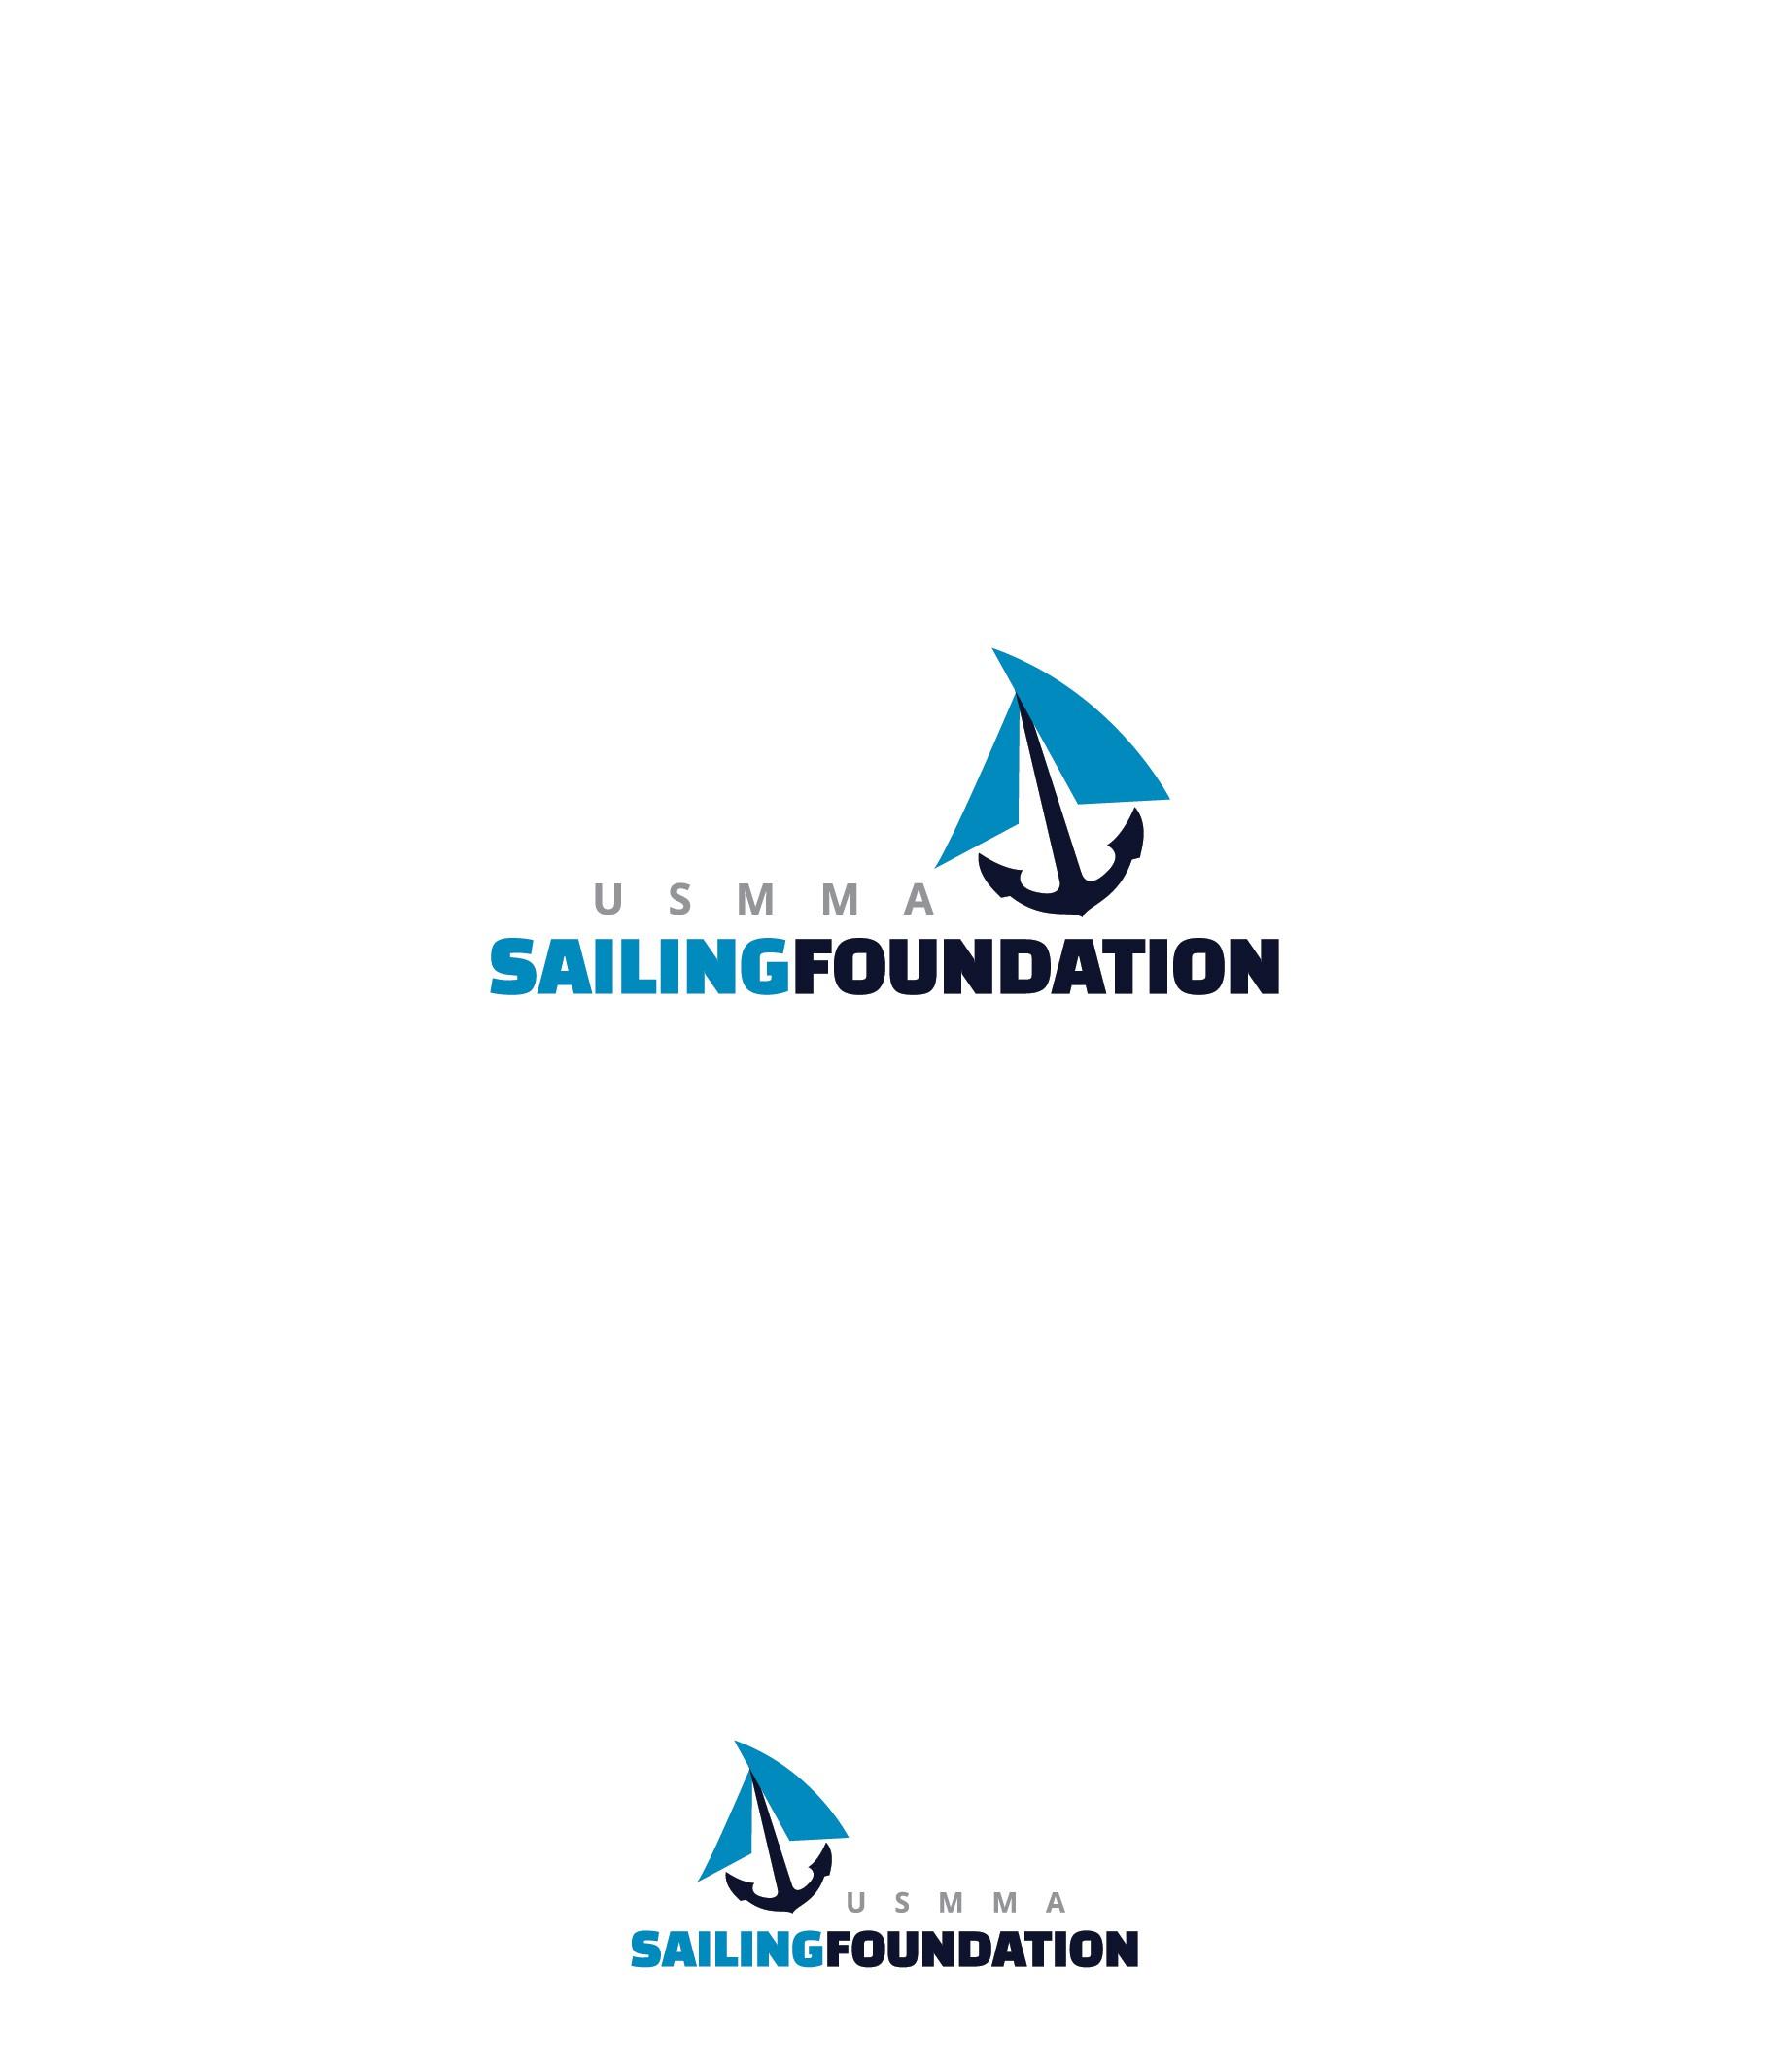 USMMA Sailing Foundation